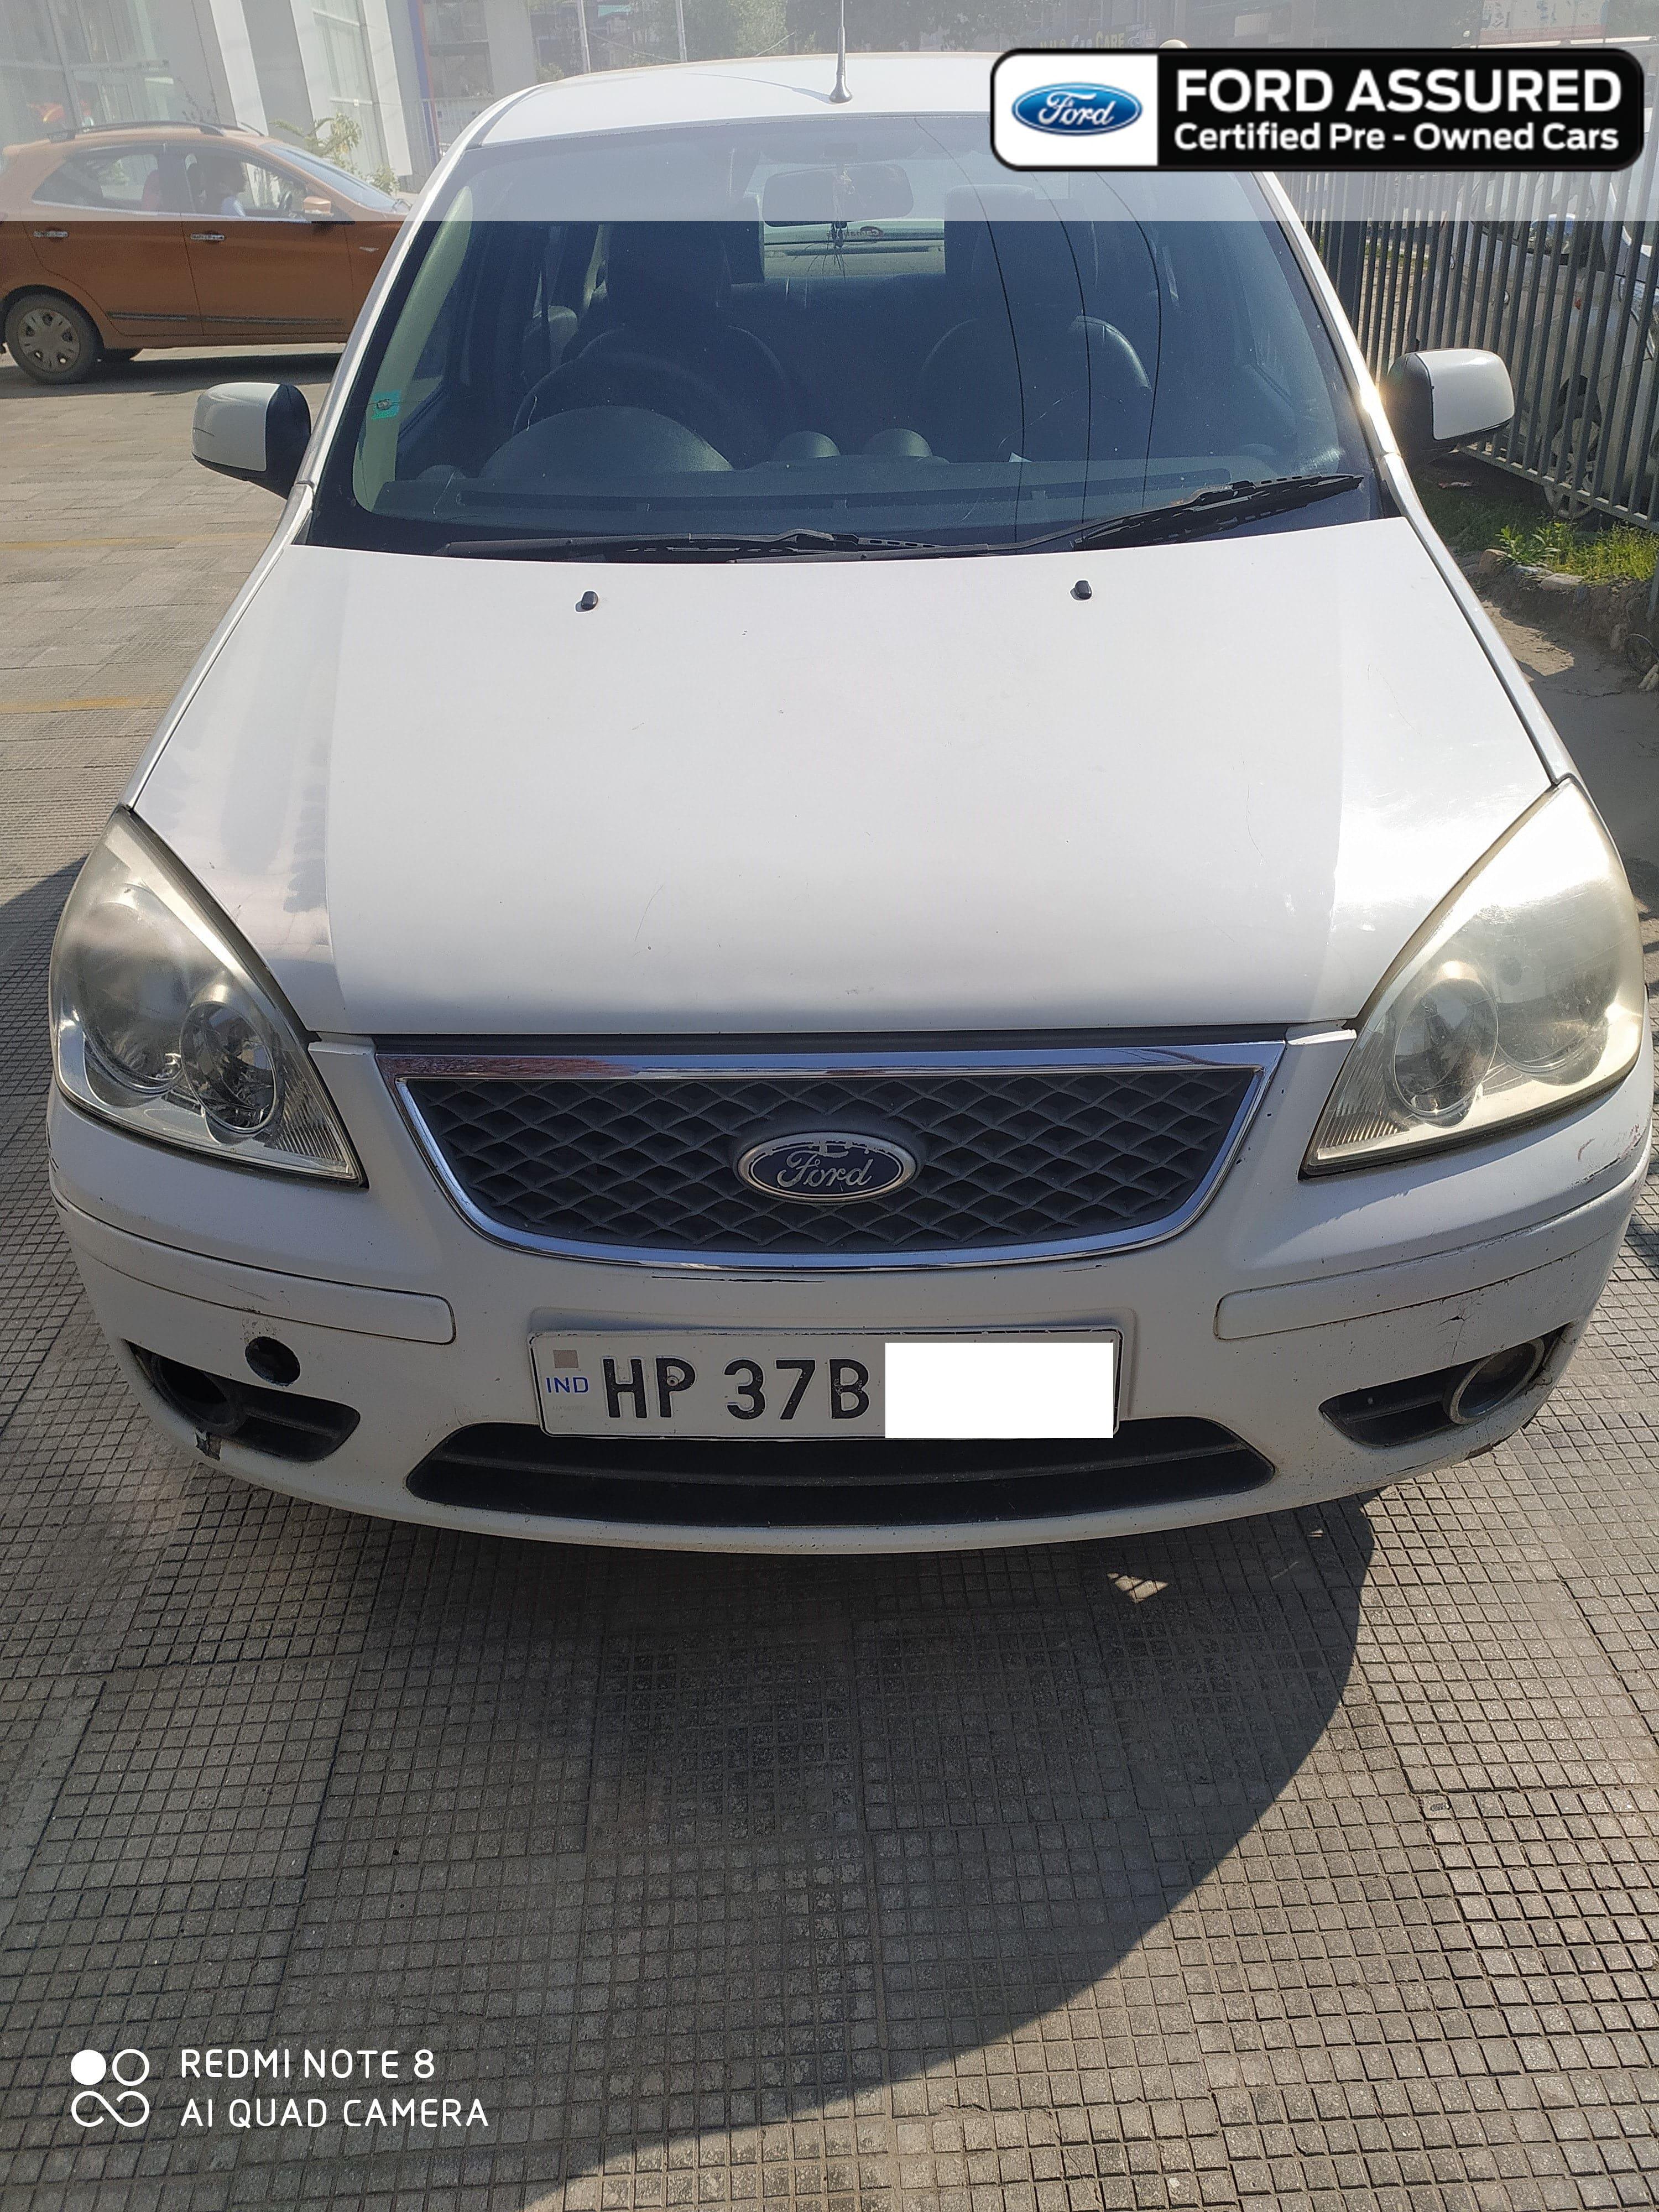 Ford Fiesta 2004-2008 1.4 TDCi EXI